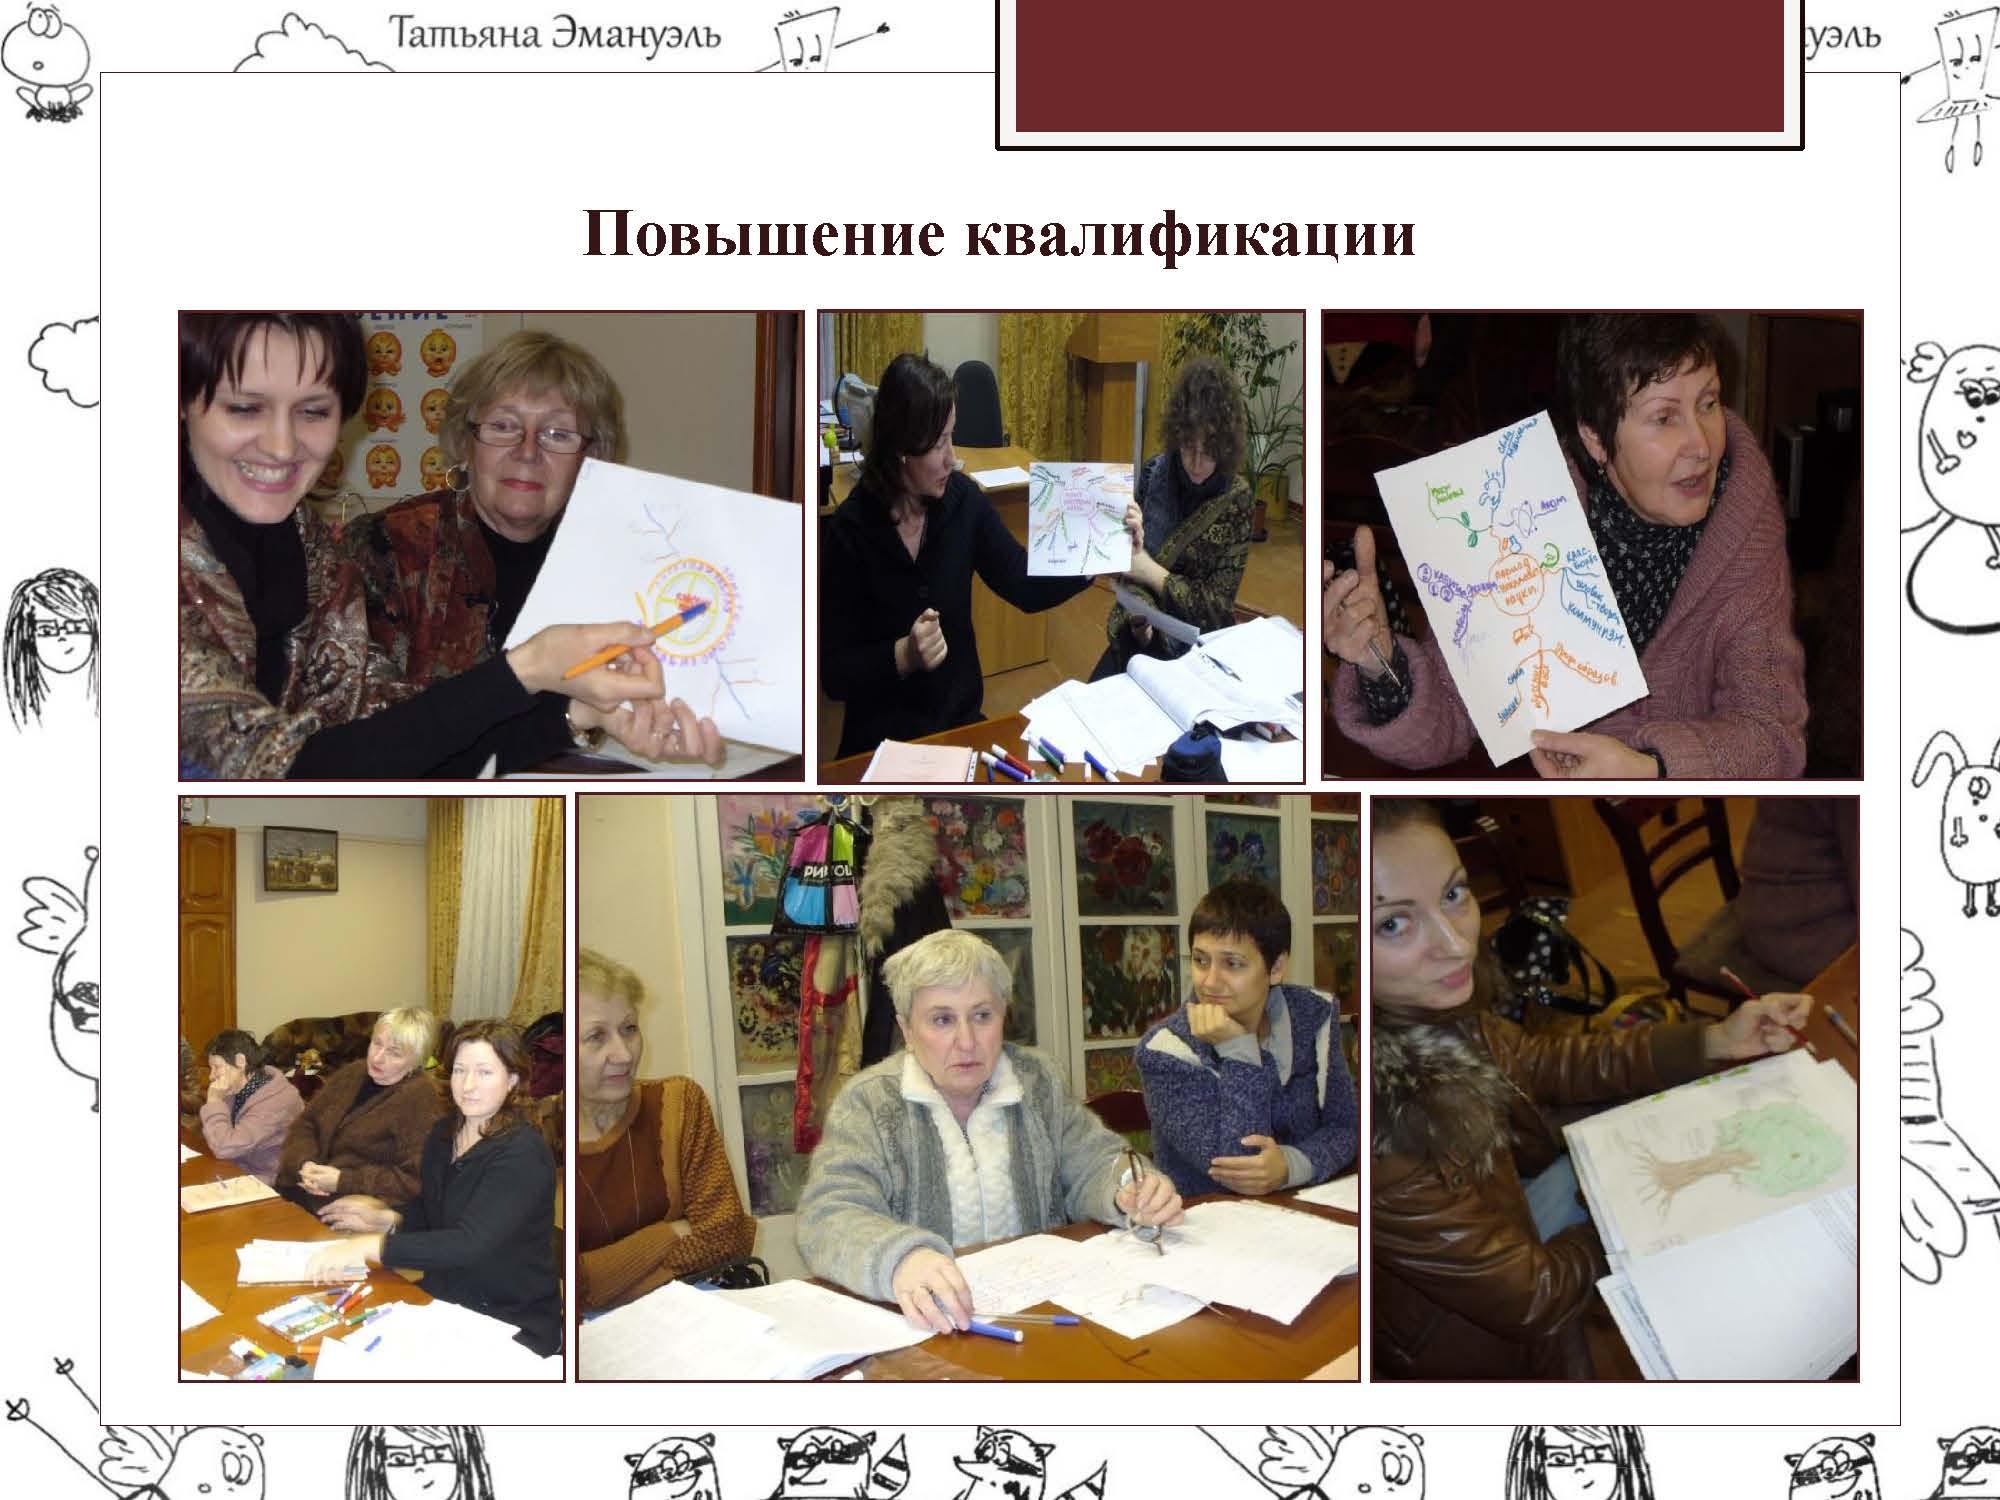 06 февраля эмануэль_Страница_062